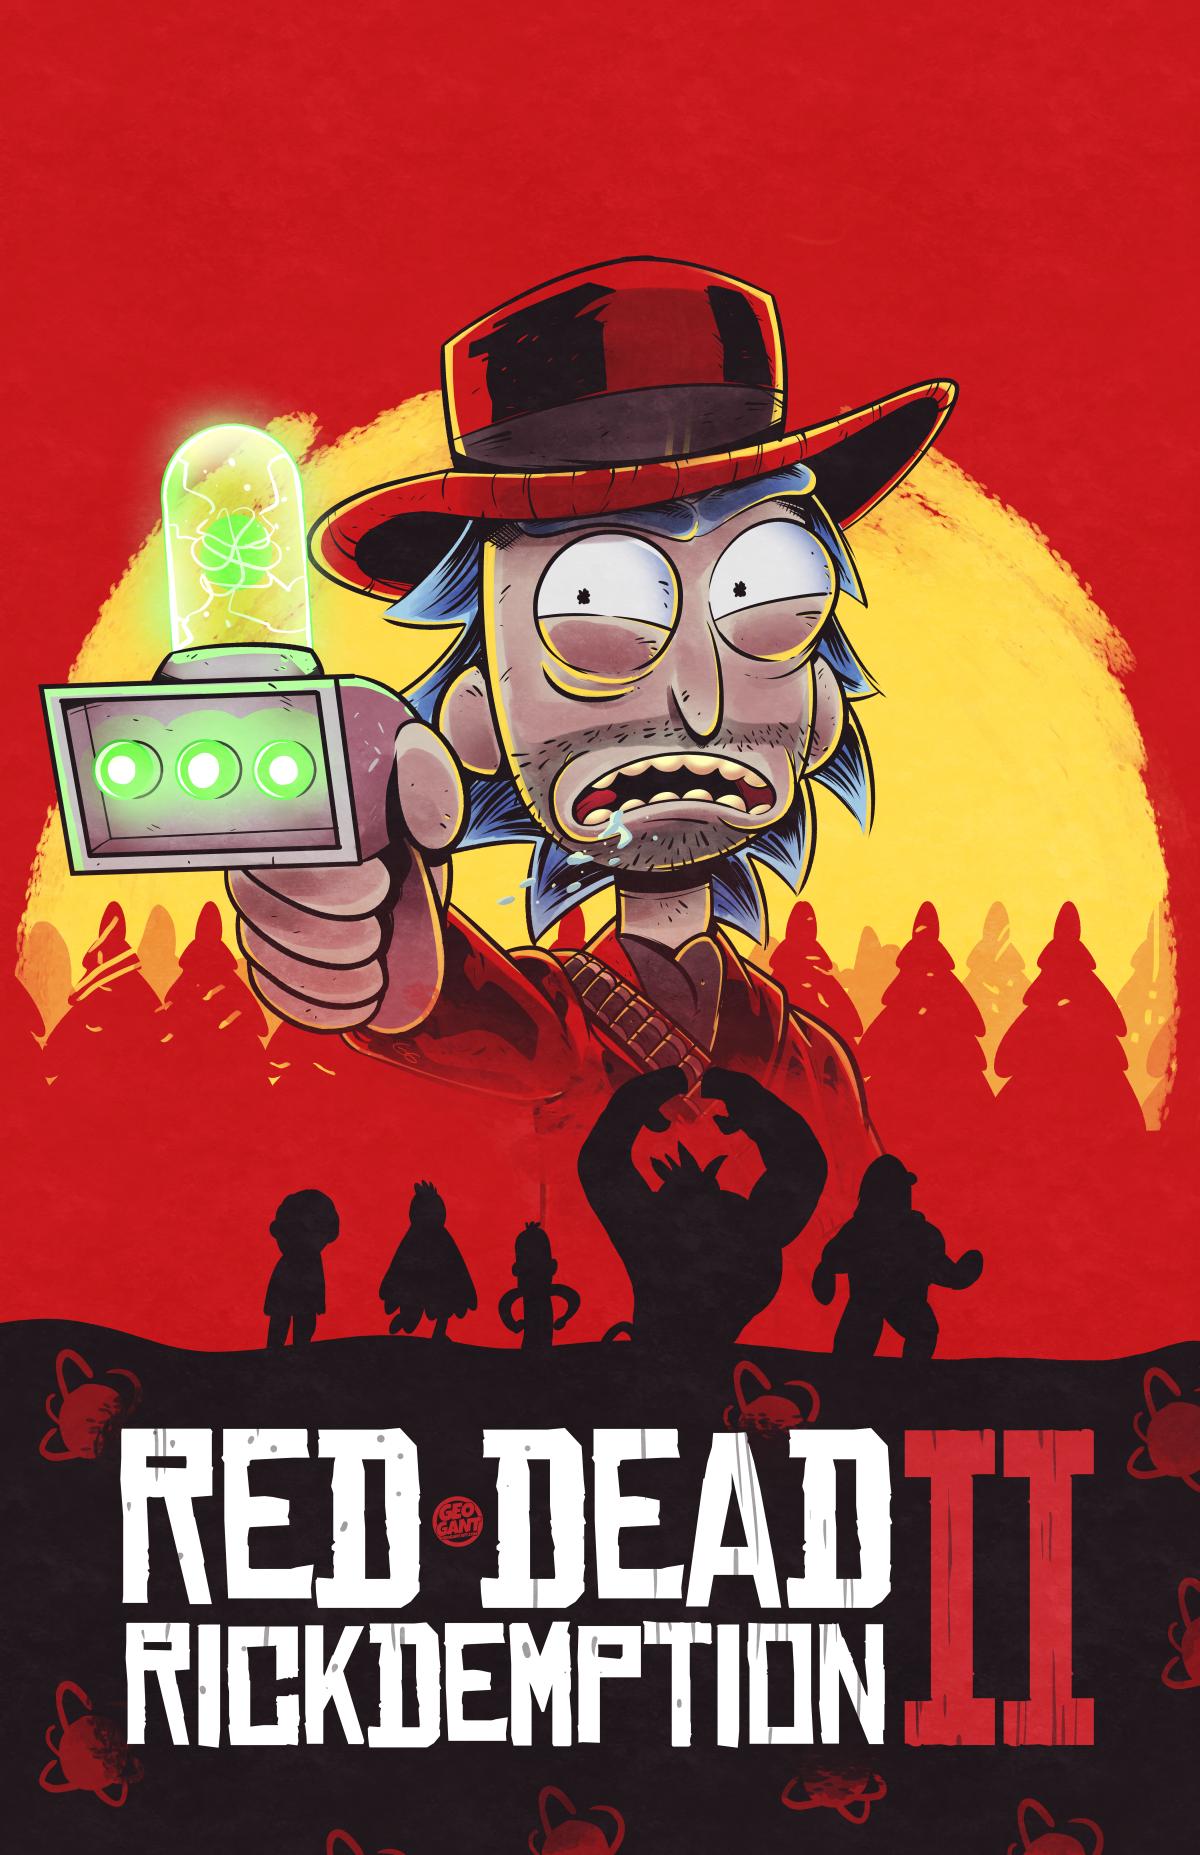 Red Dead Rickdemption II